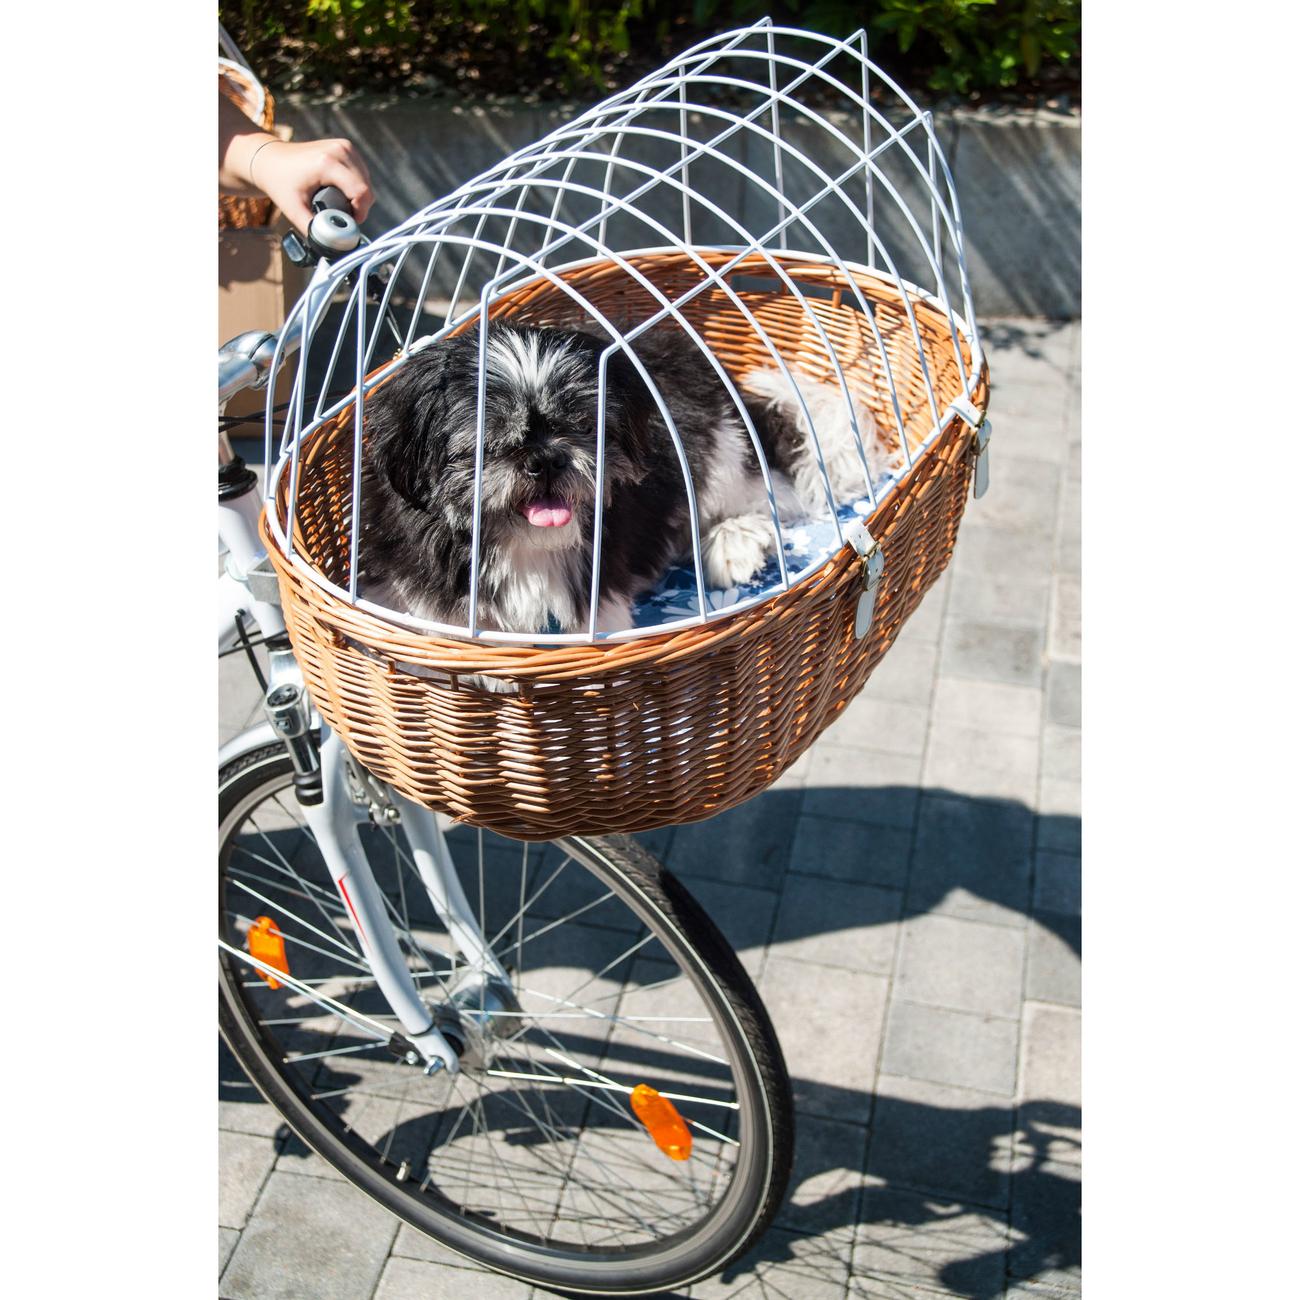 Aumüller E-Bike Hunde Fahrradkorb Standard vorne, Bild 5